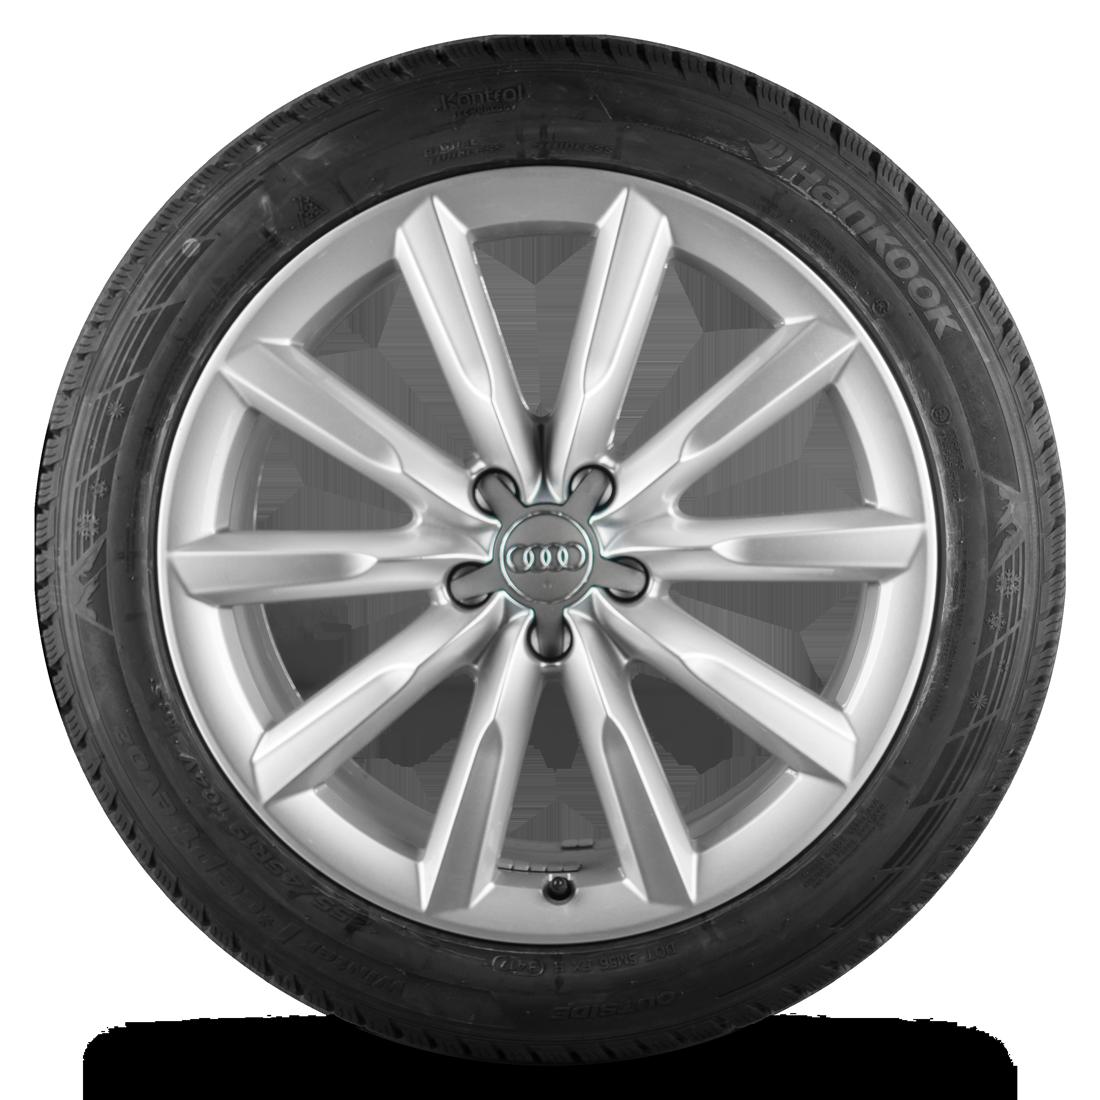 Audi 19 Zoll Felgen A6 S6 4G C7 Allroad Alufelgen Winterreifen Neu Winterräder